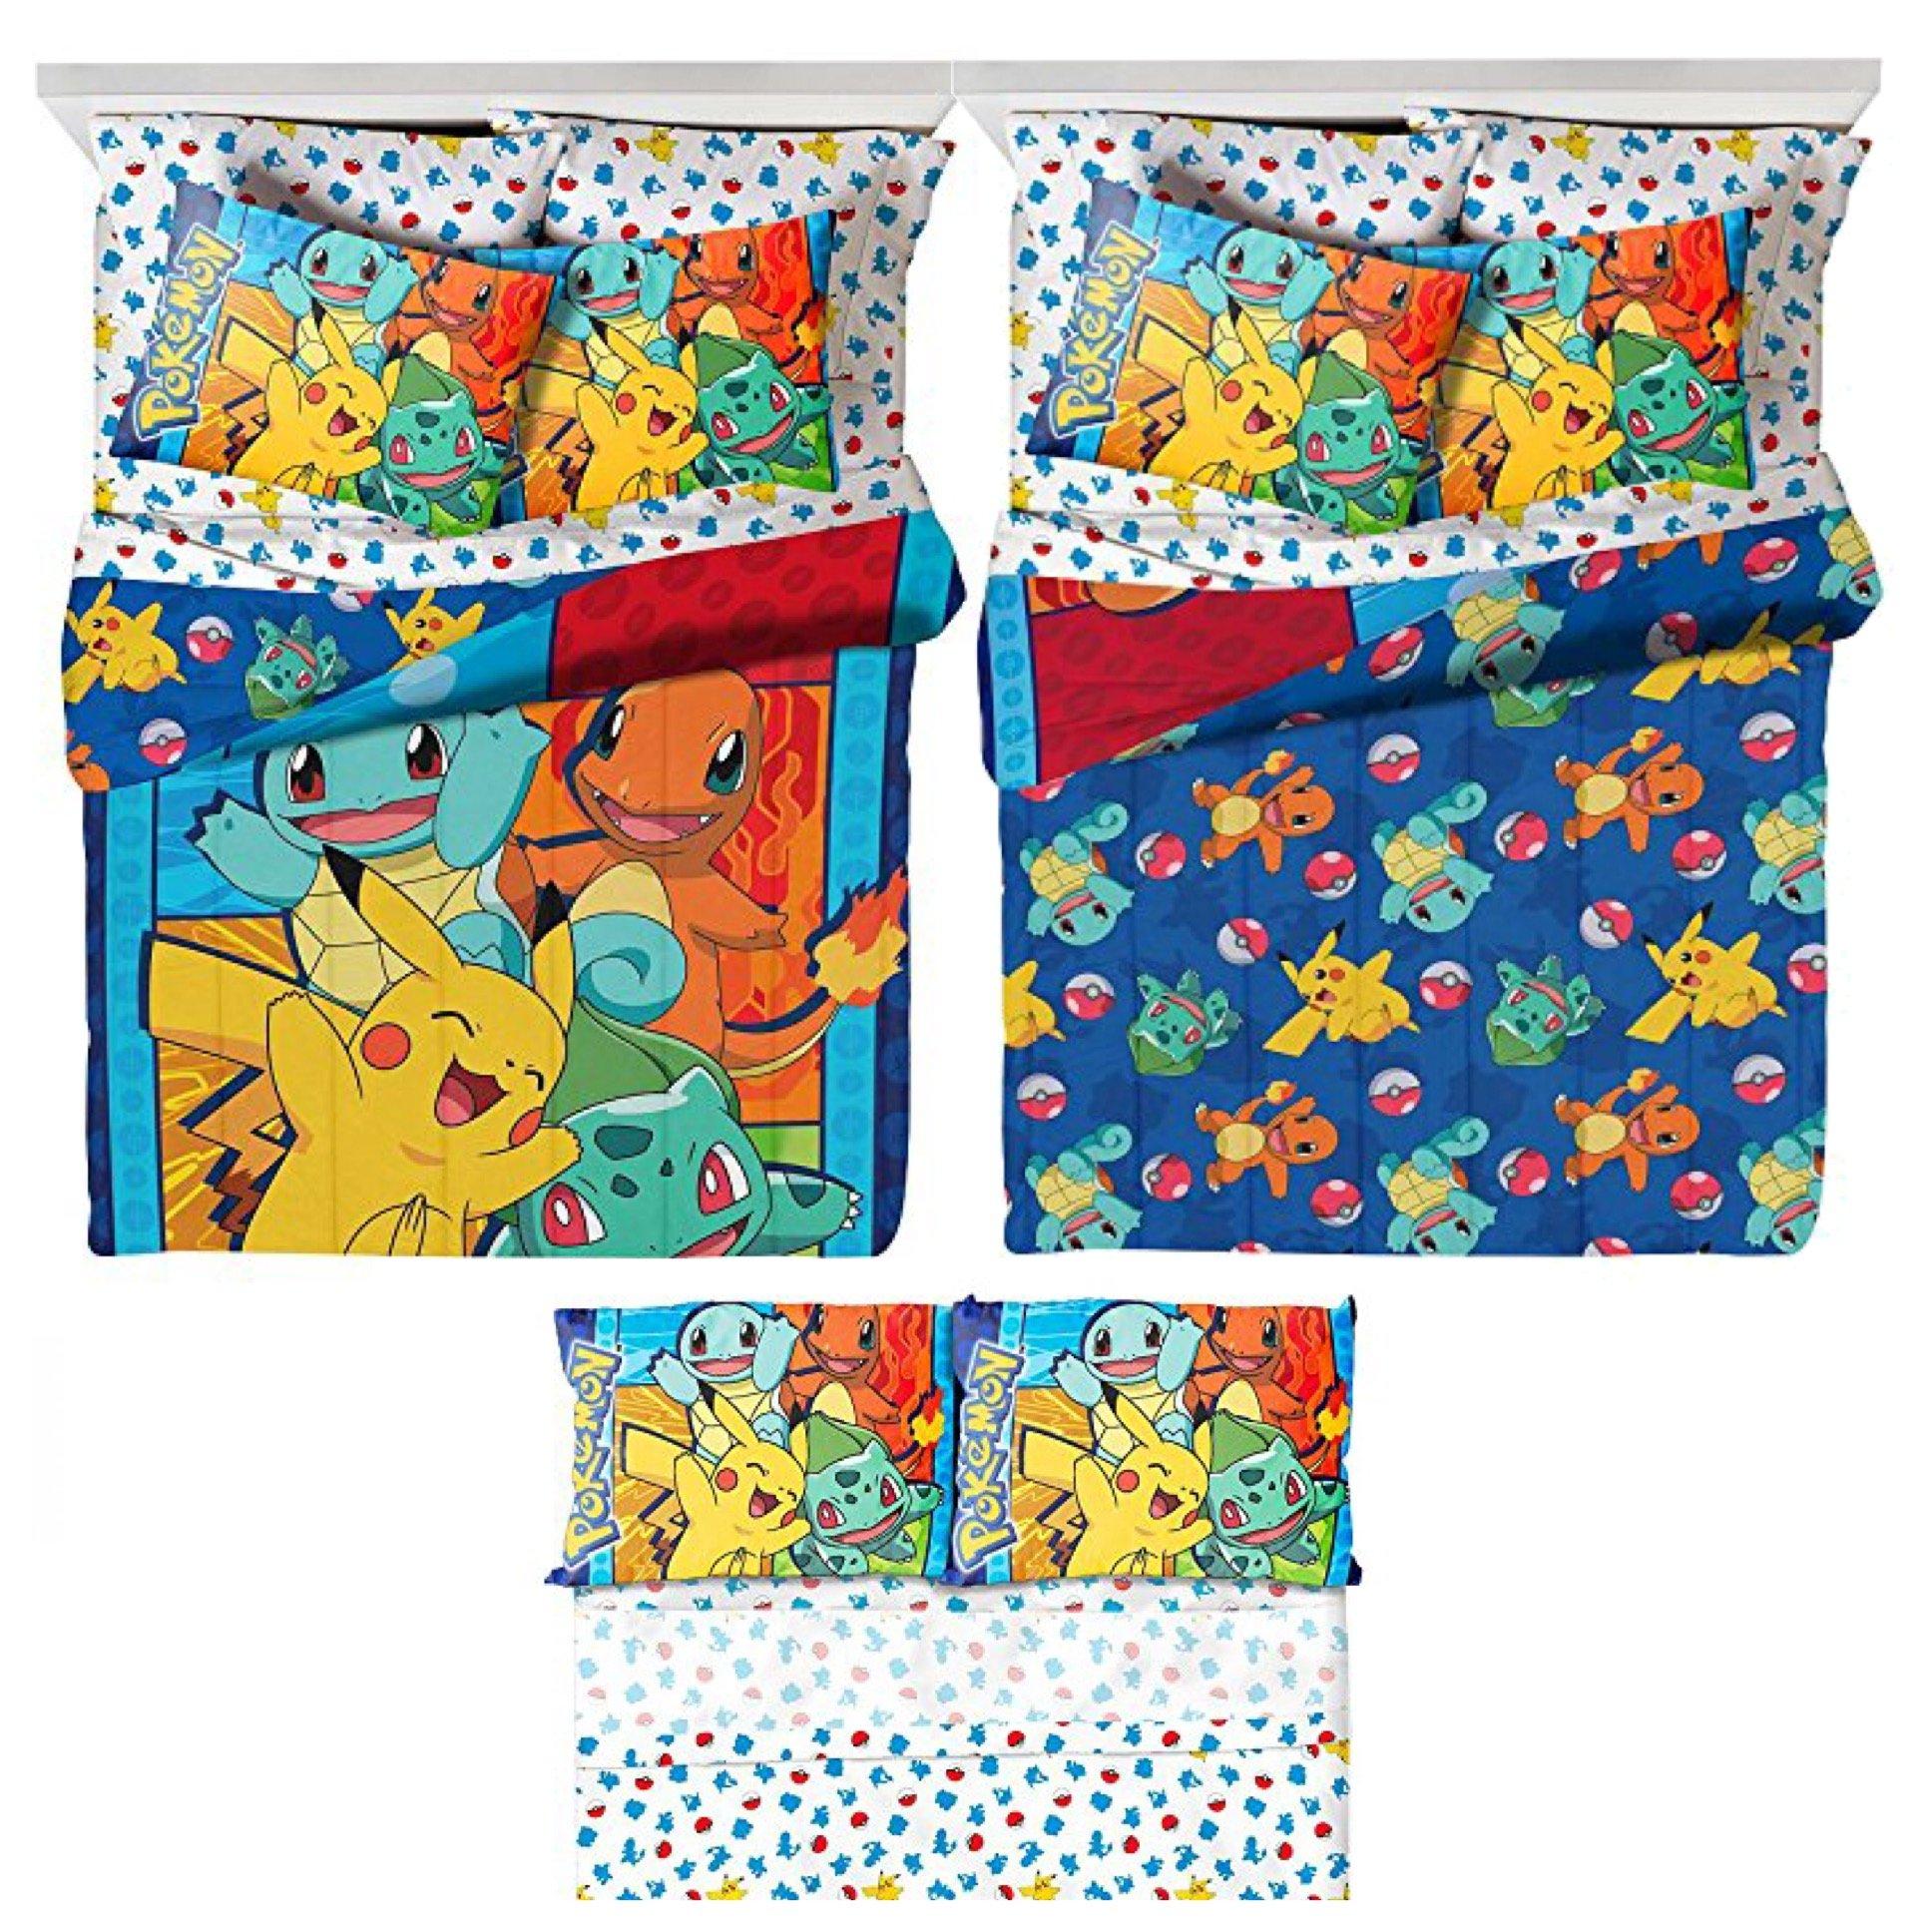 Pokémon 5 Piece Kids Full Bedding Set - Reversible Comforter, Sheet Set with 2 Reversible Pillowcases